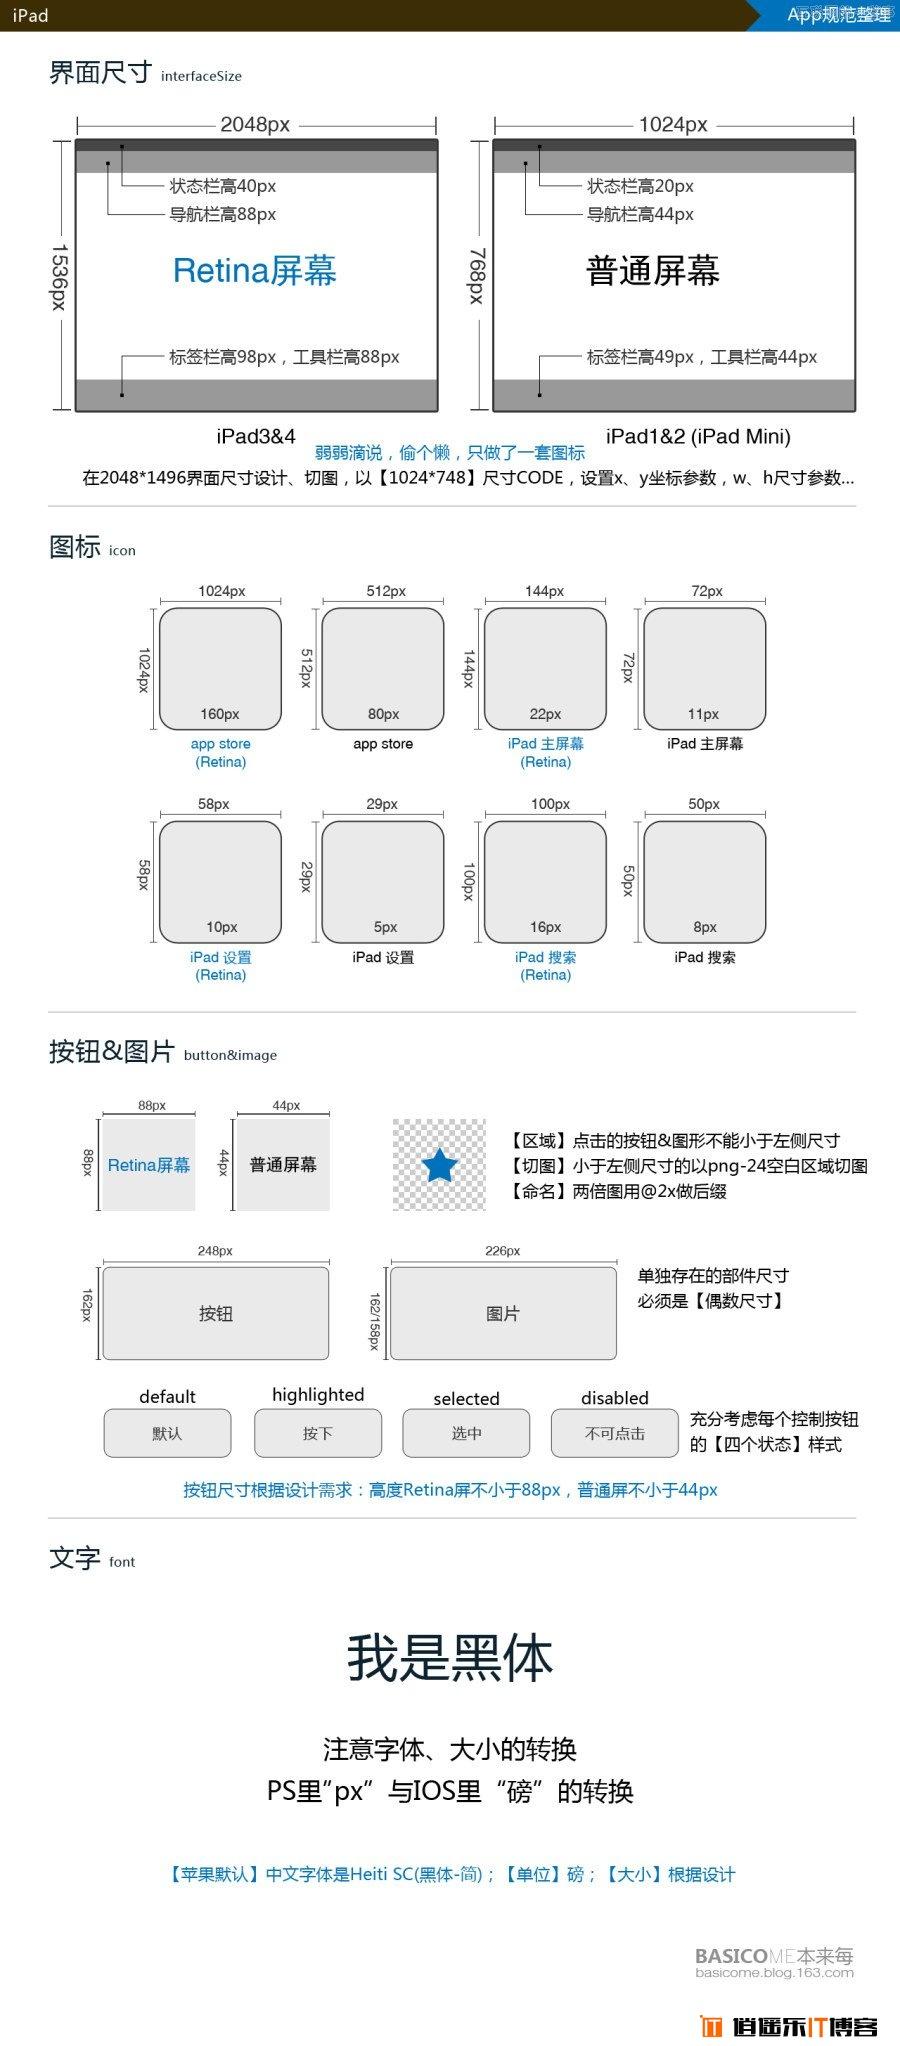 iOS设备App界面UI设计规范